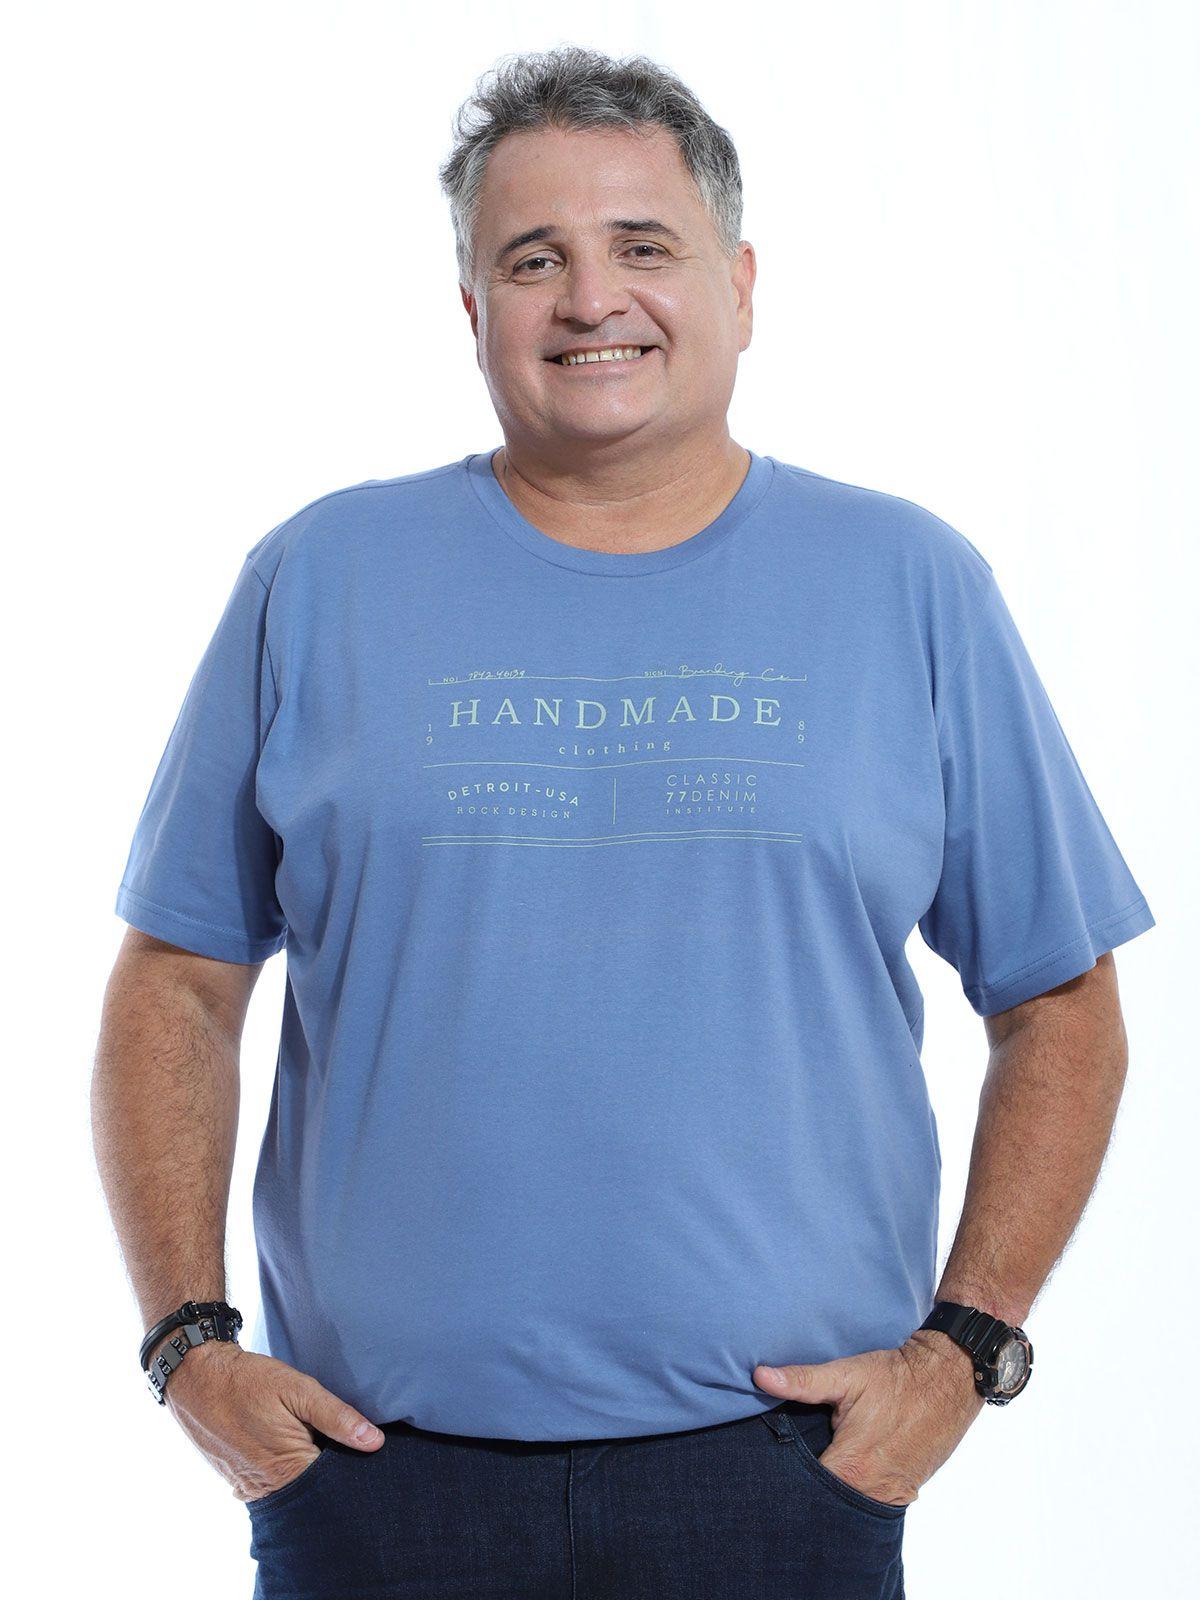 Camiseta Plus Size Masculina Manga Curta Estampada Indigo